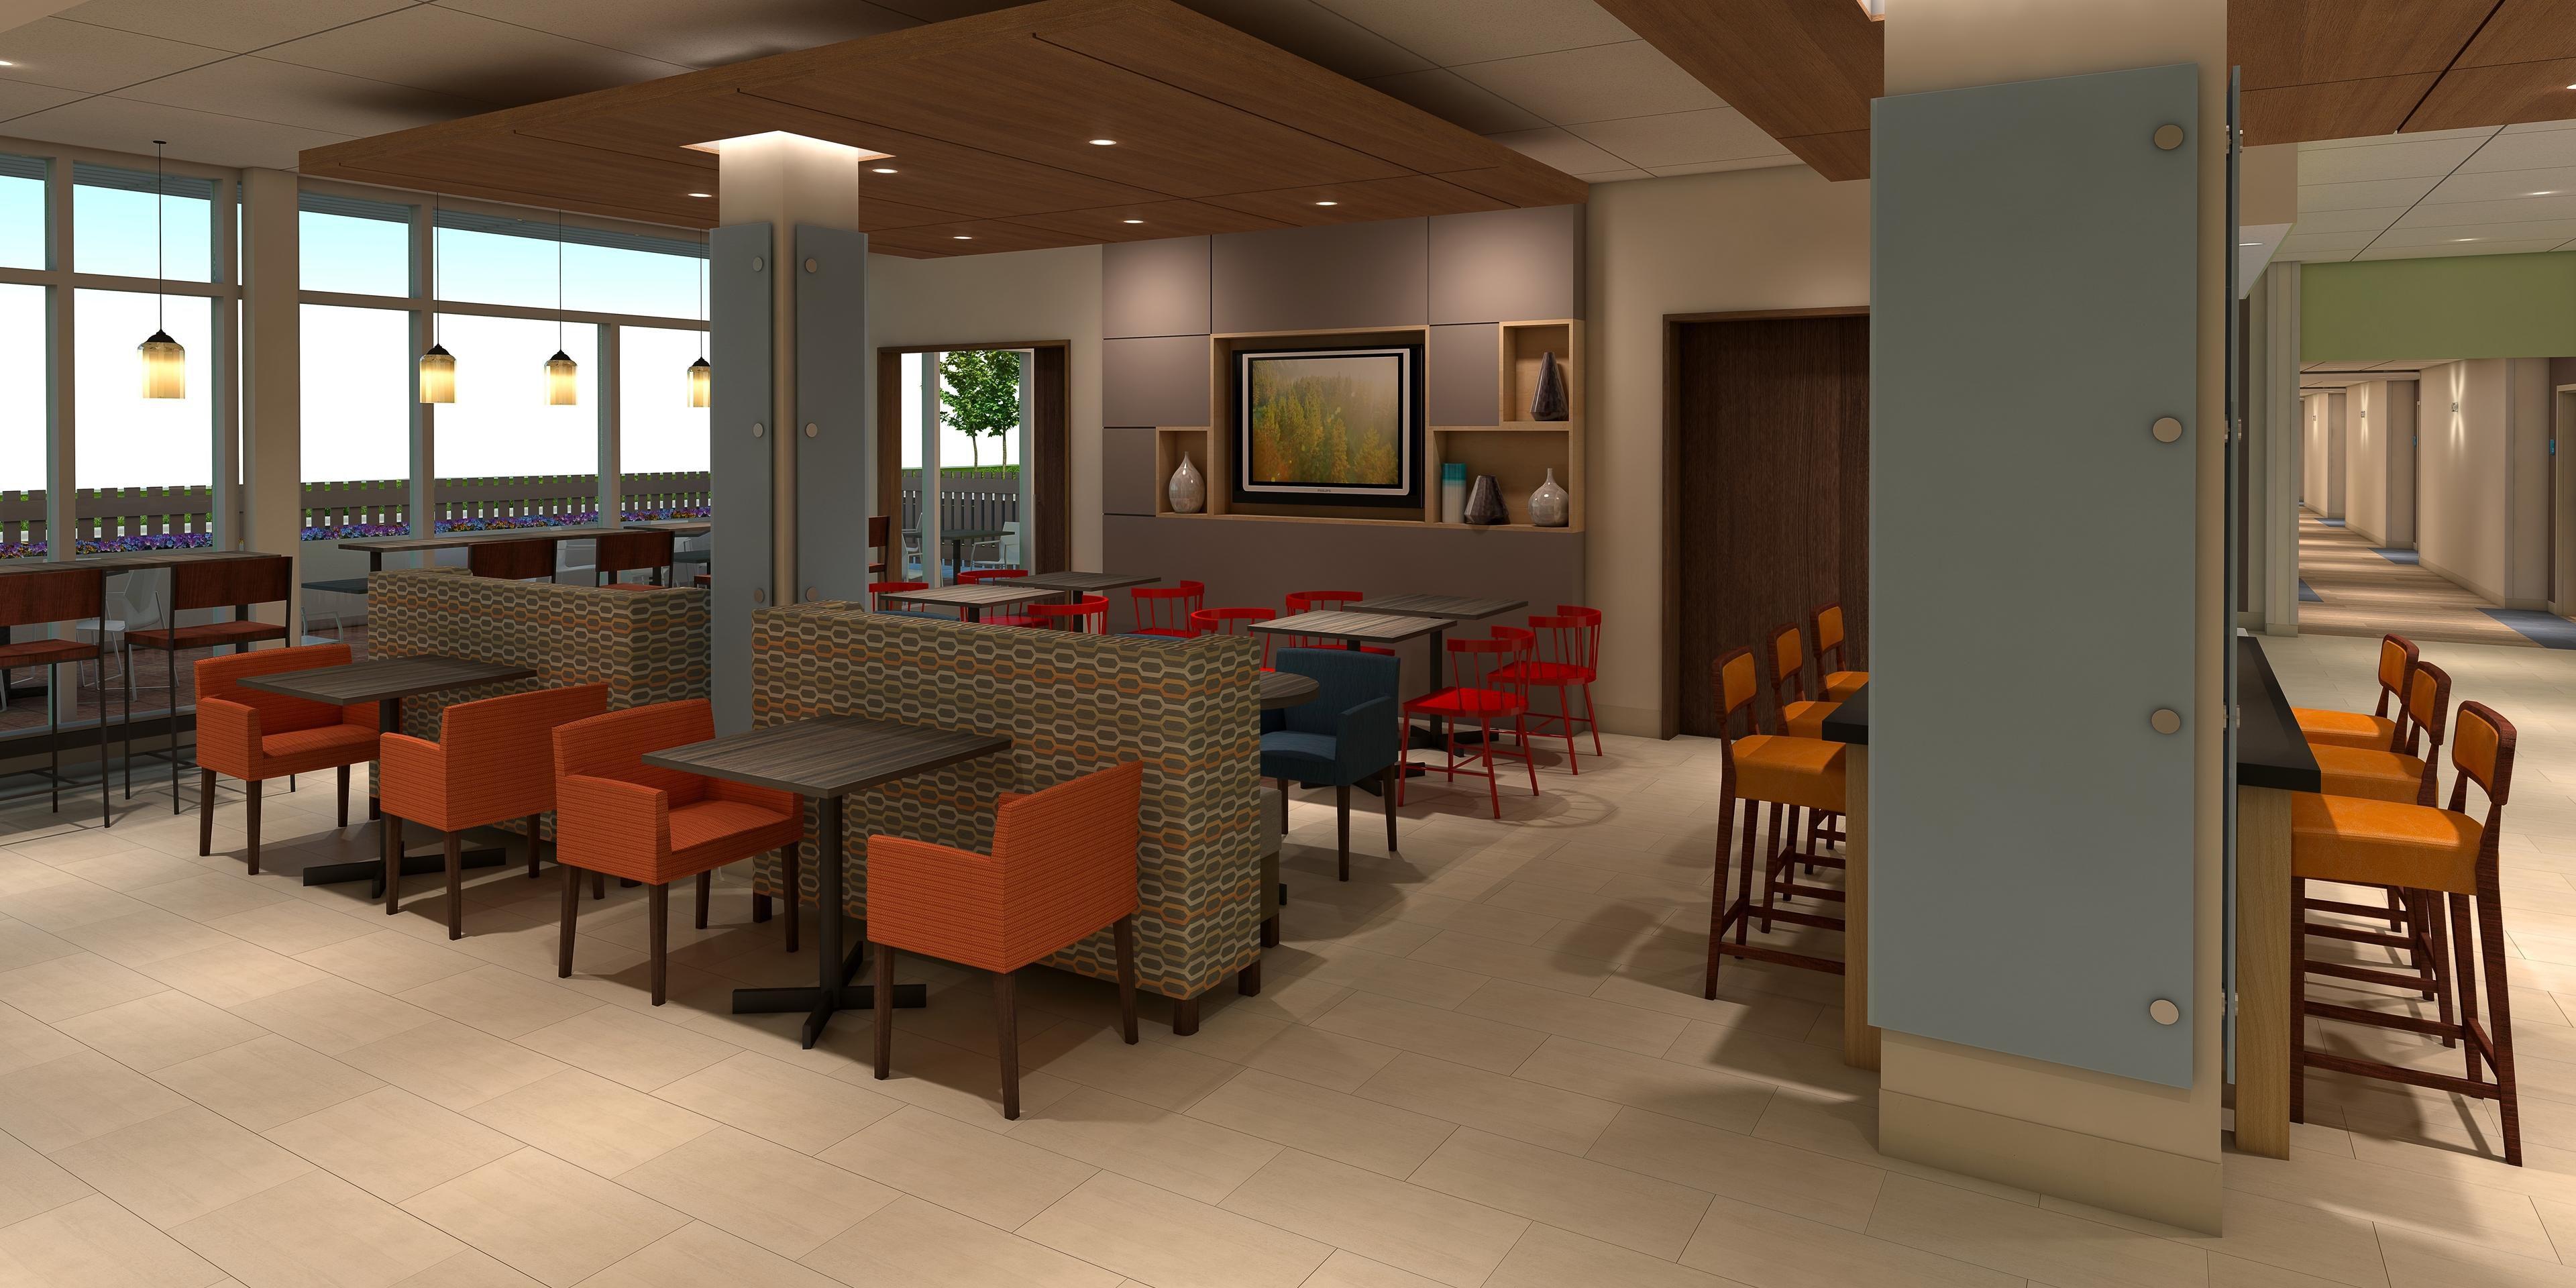 Holiday Inn Express U0026 Suites Blackwell Hotel By IHG